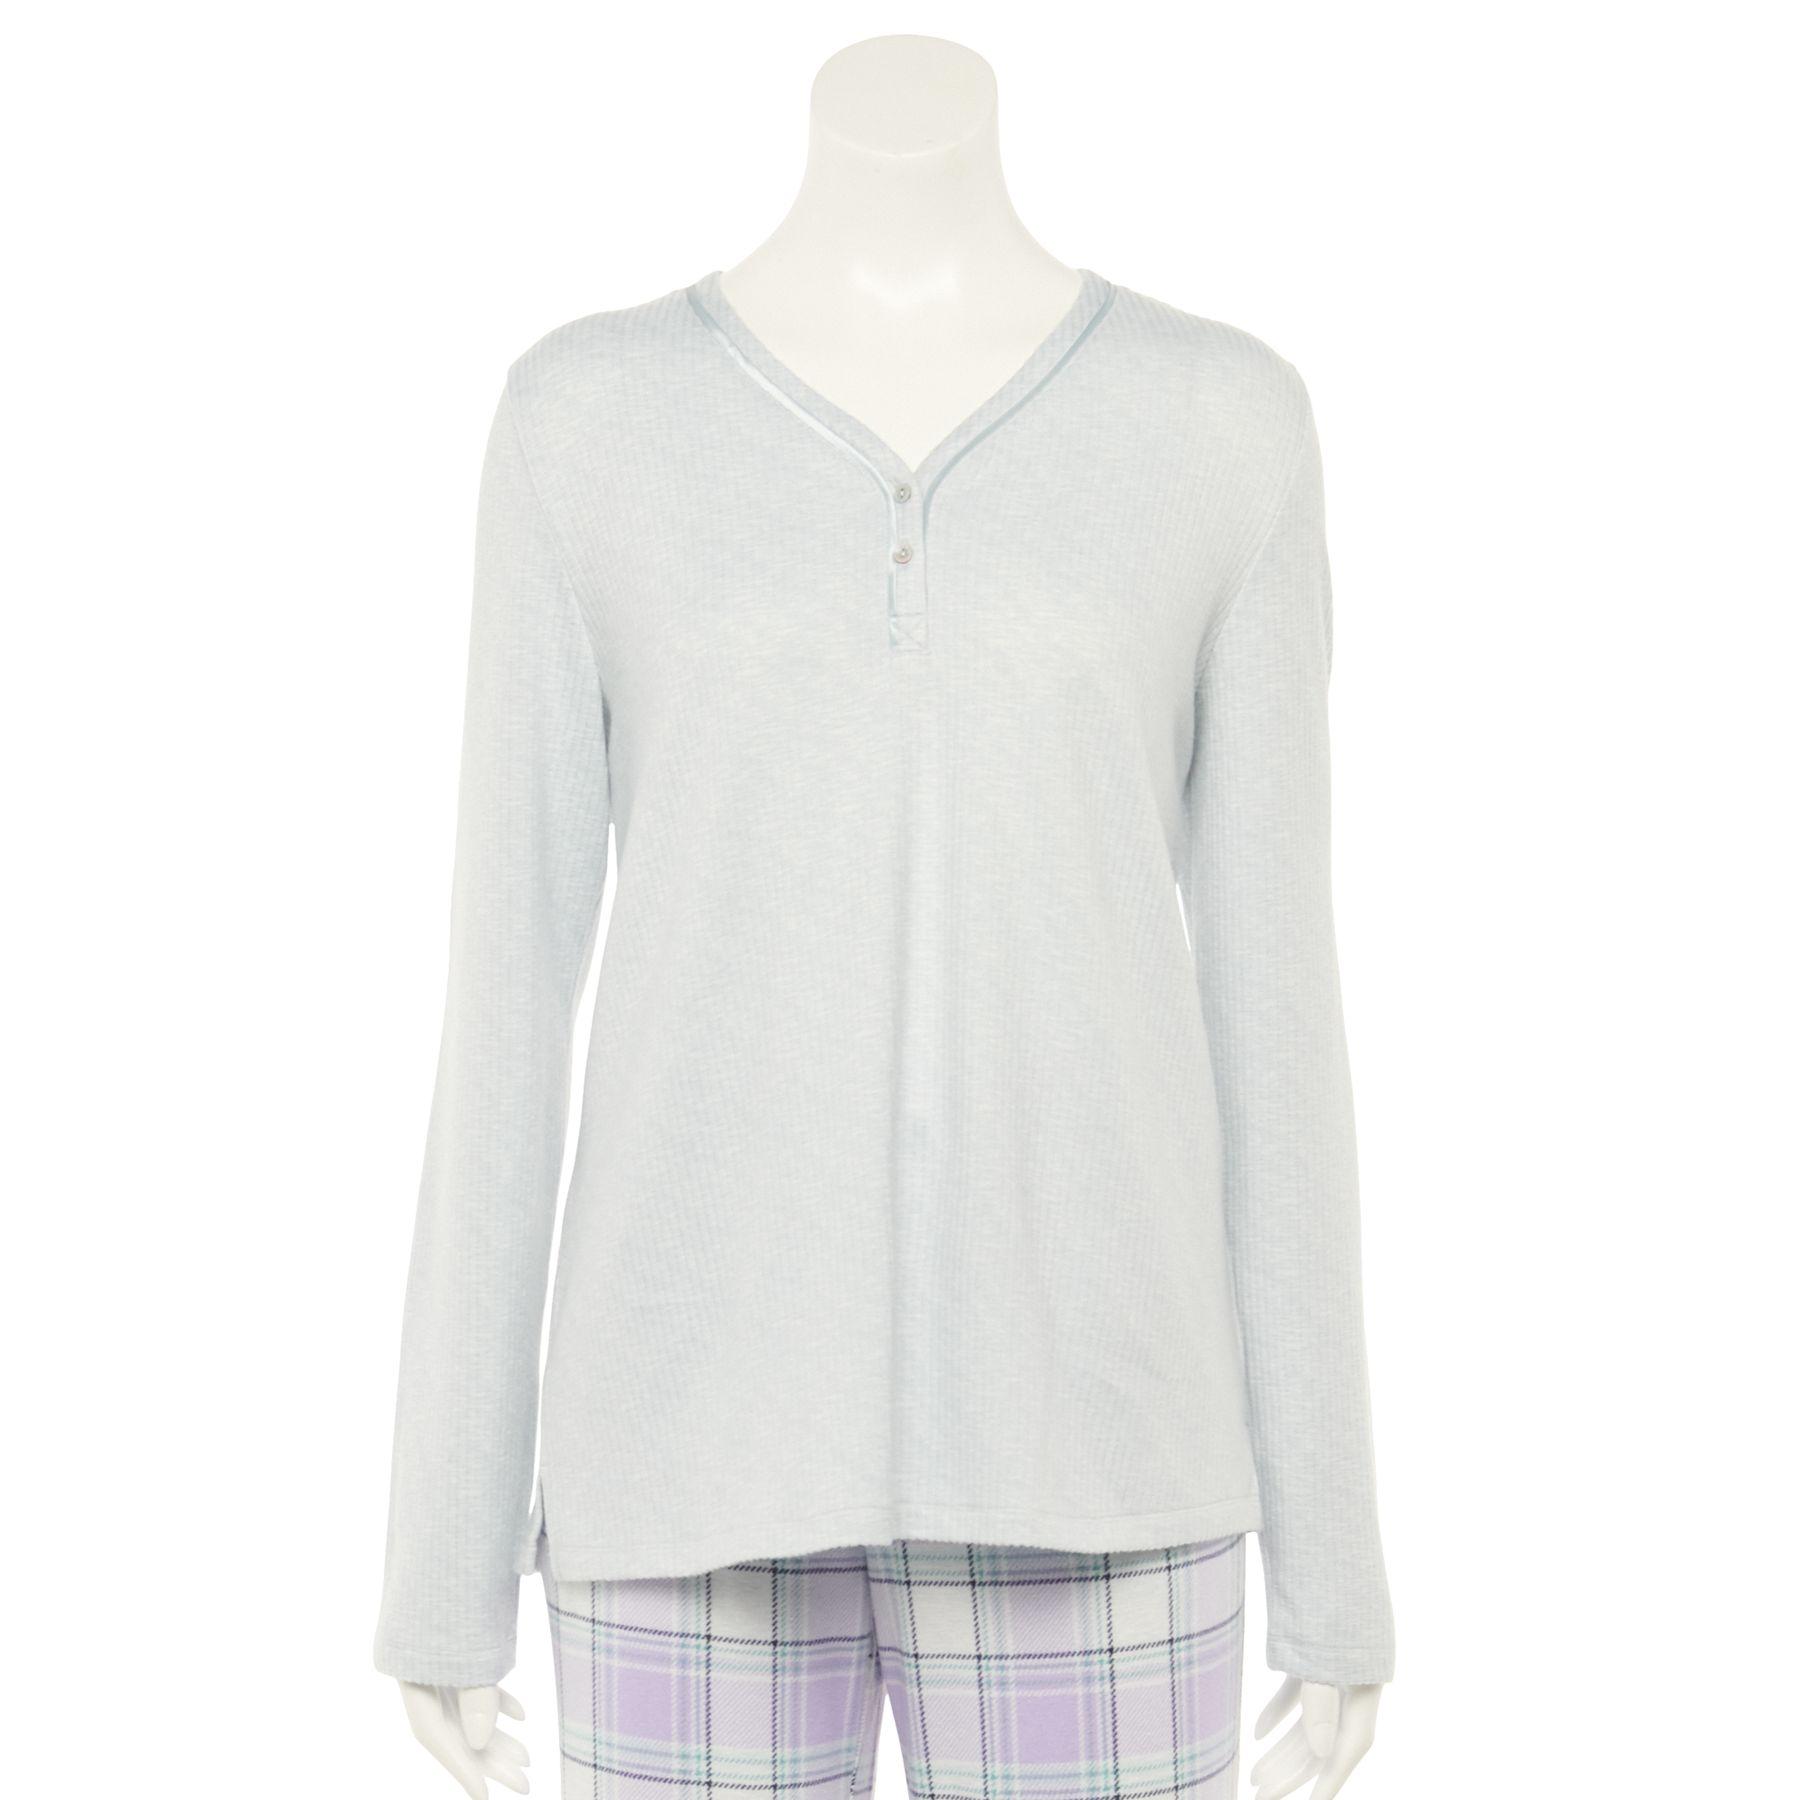 Women's Croft & Barrow® Whisperluxe Henley Pajama Top